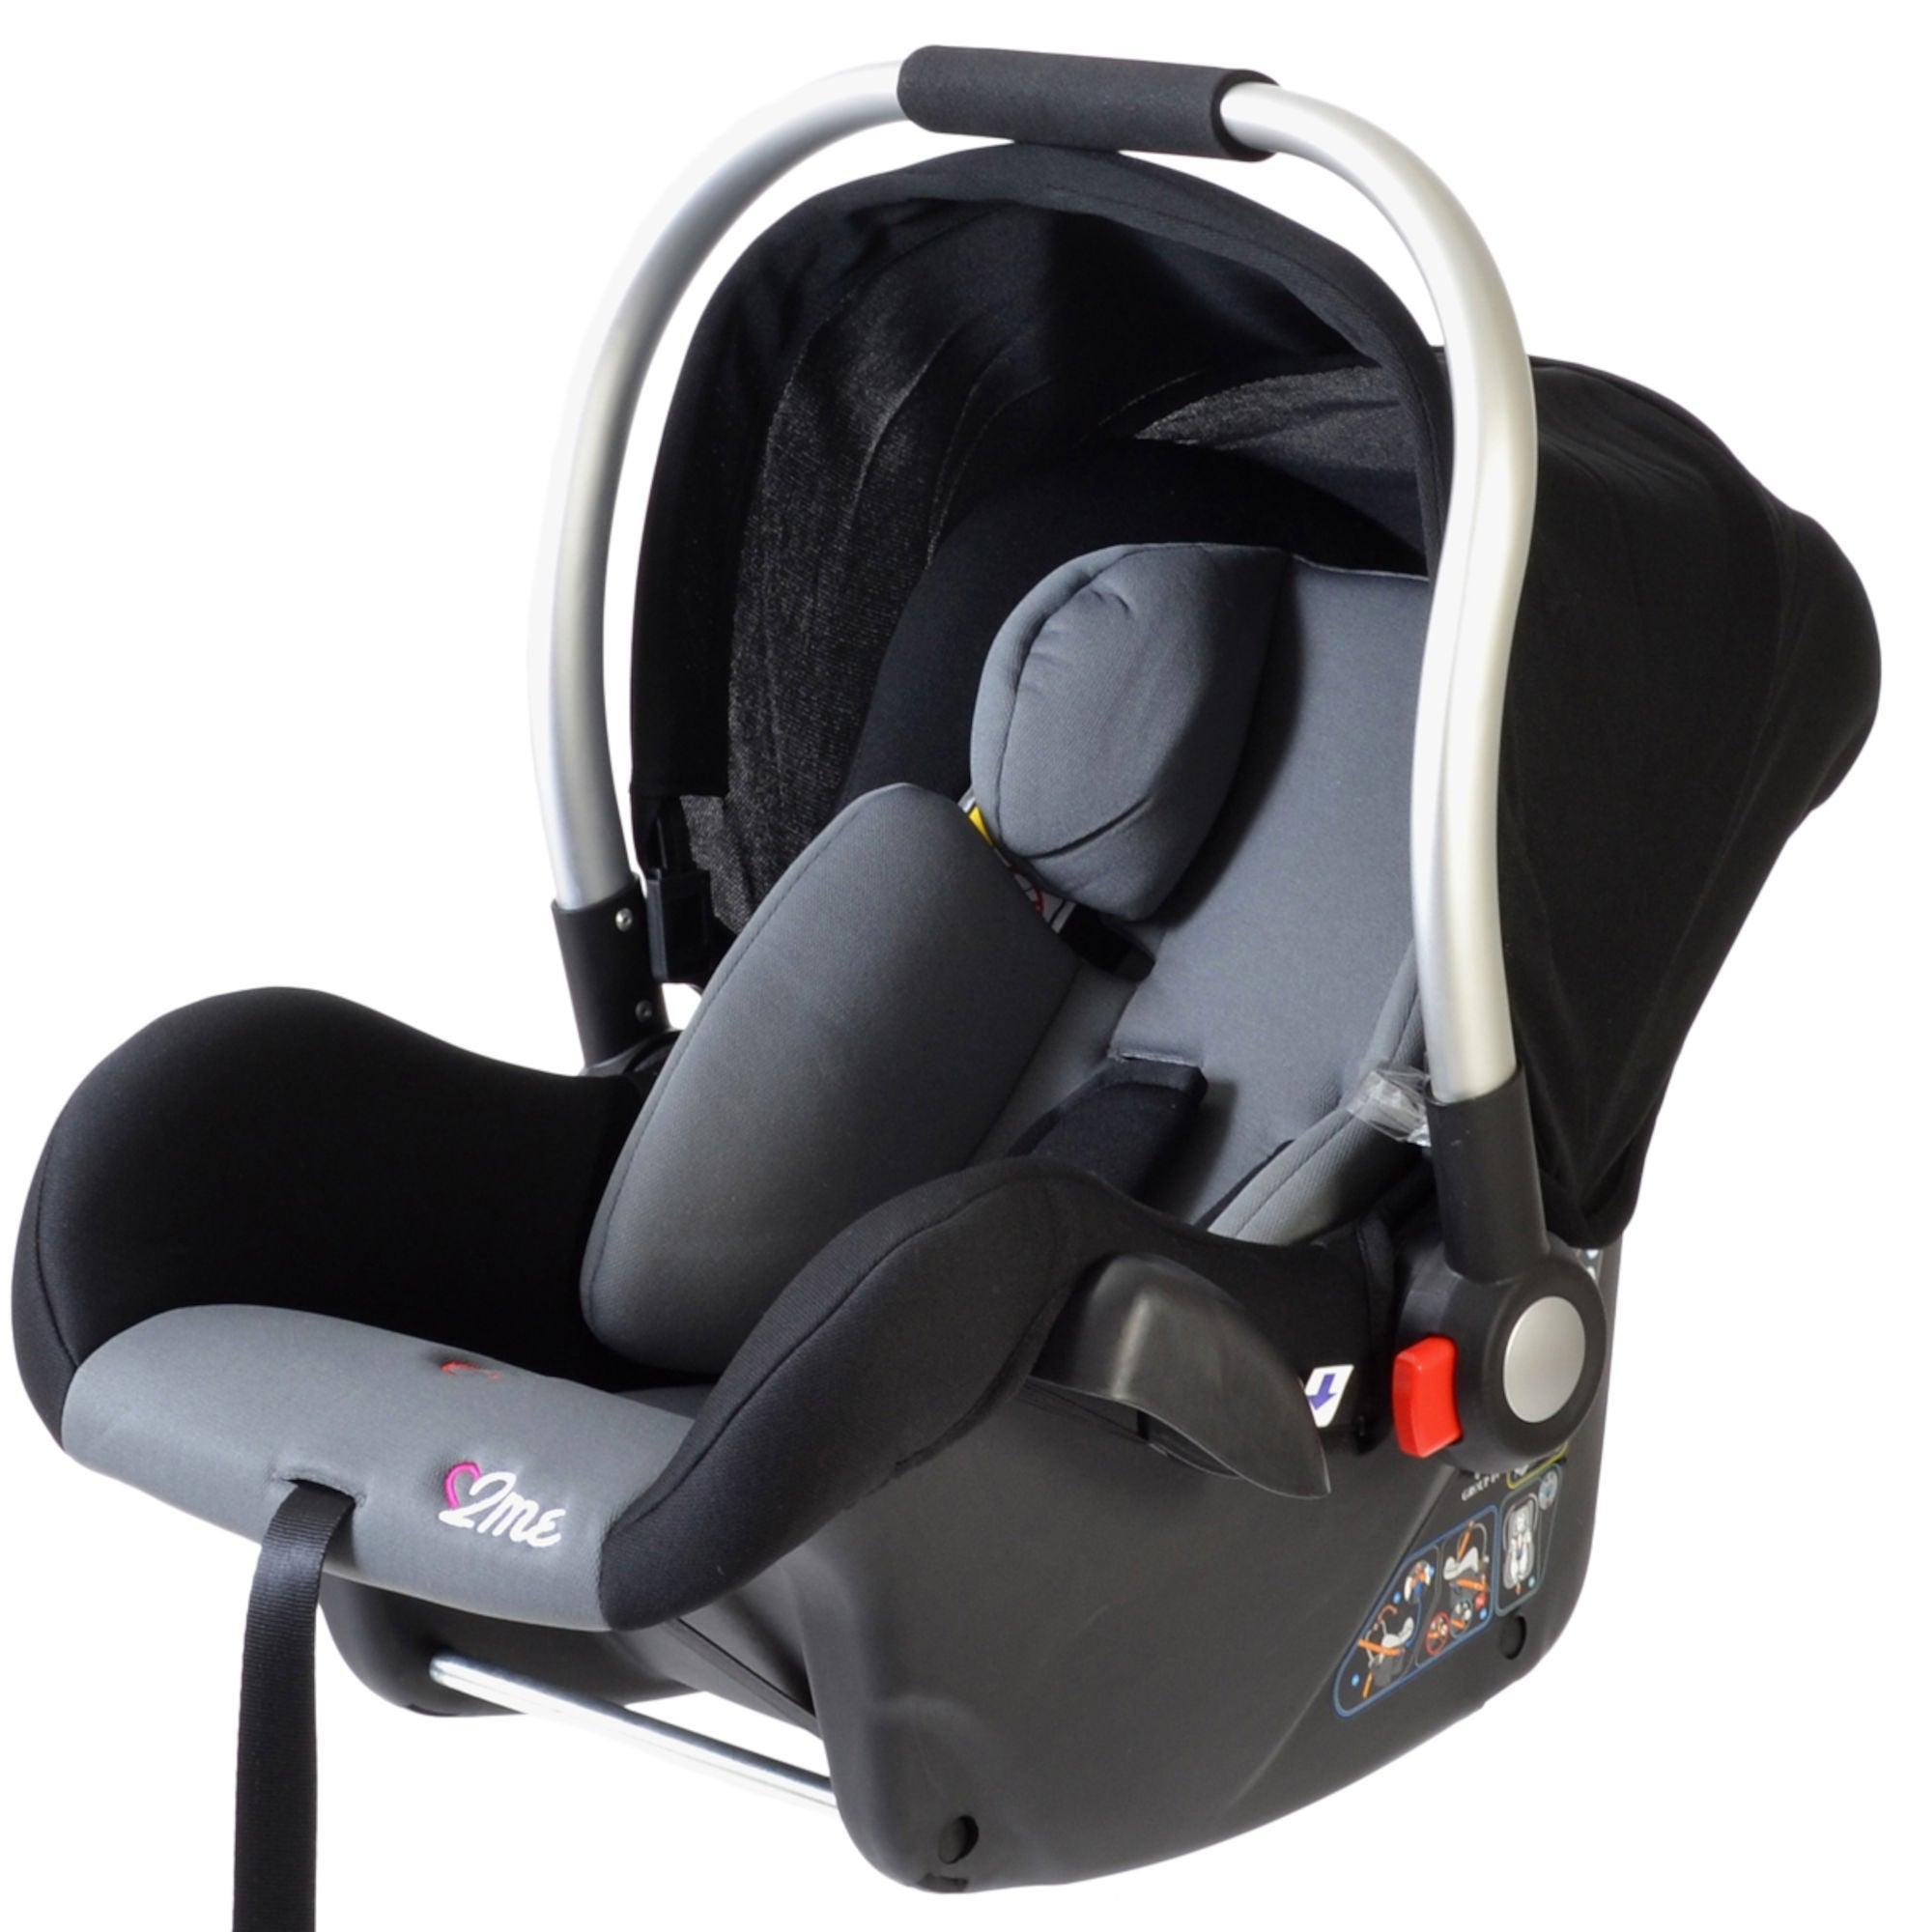 2ME Babyskydd Monza Grå